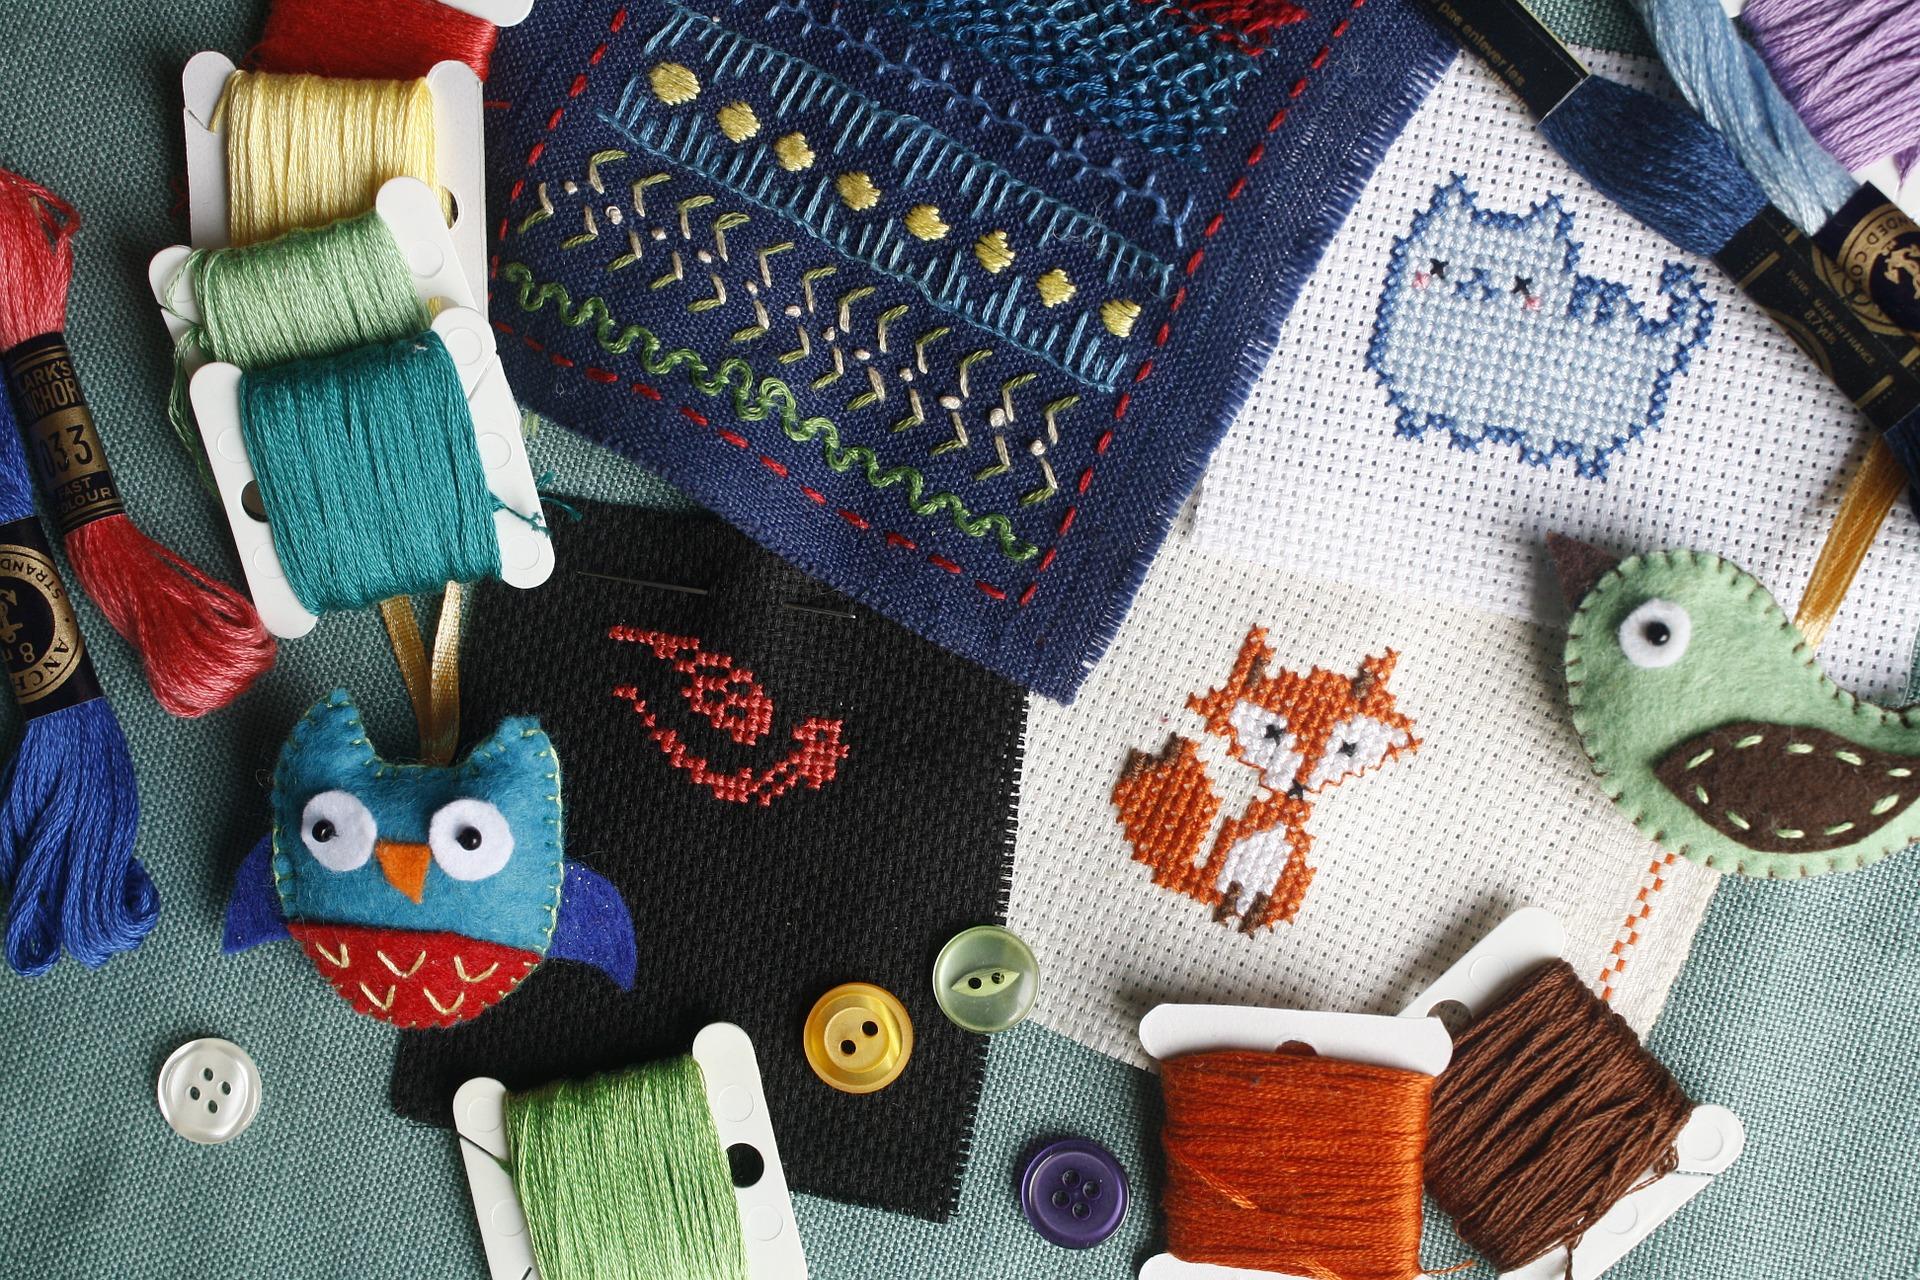 custom embroidery